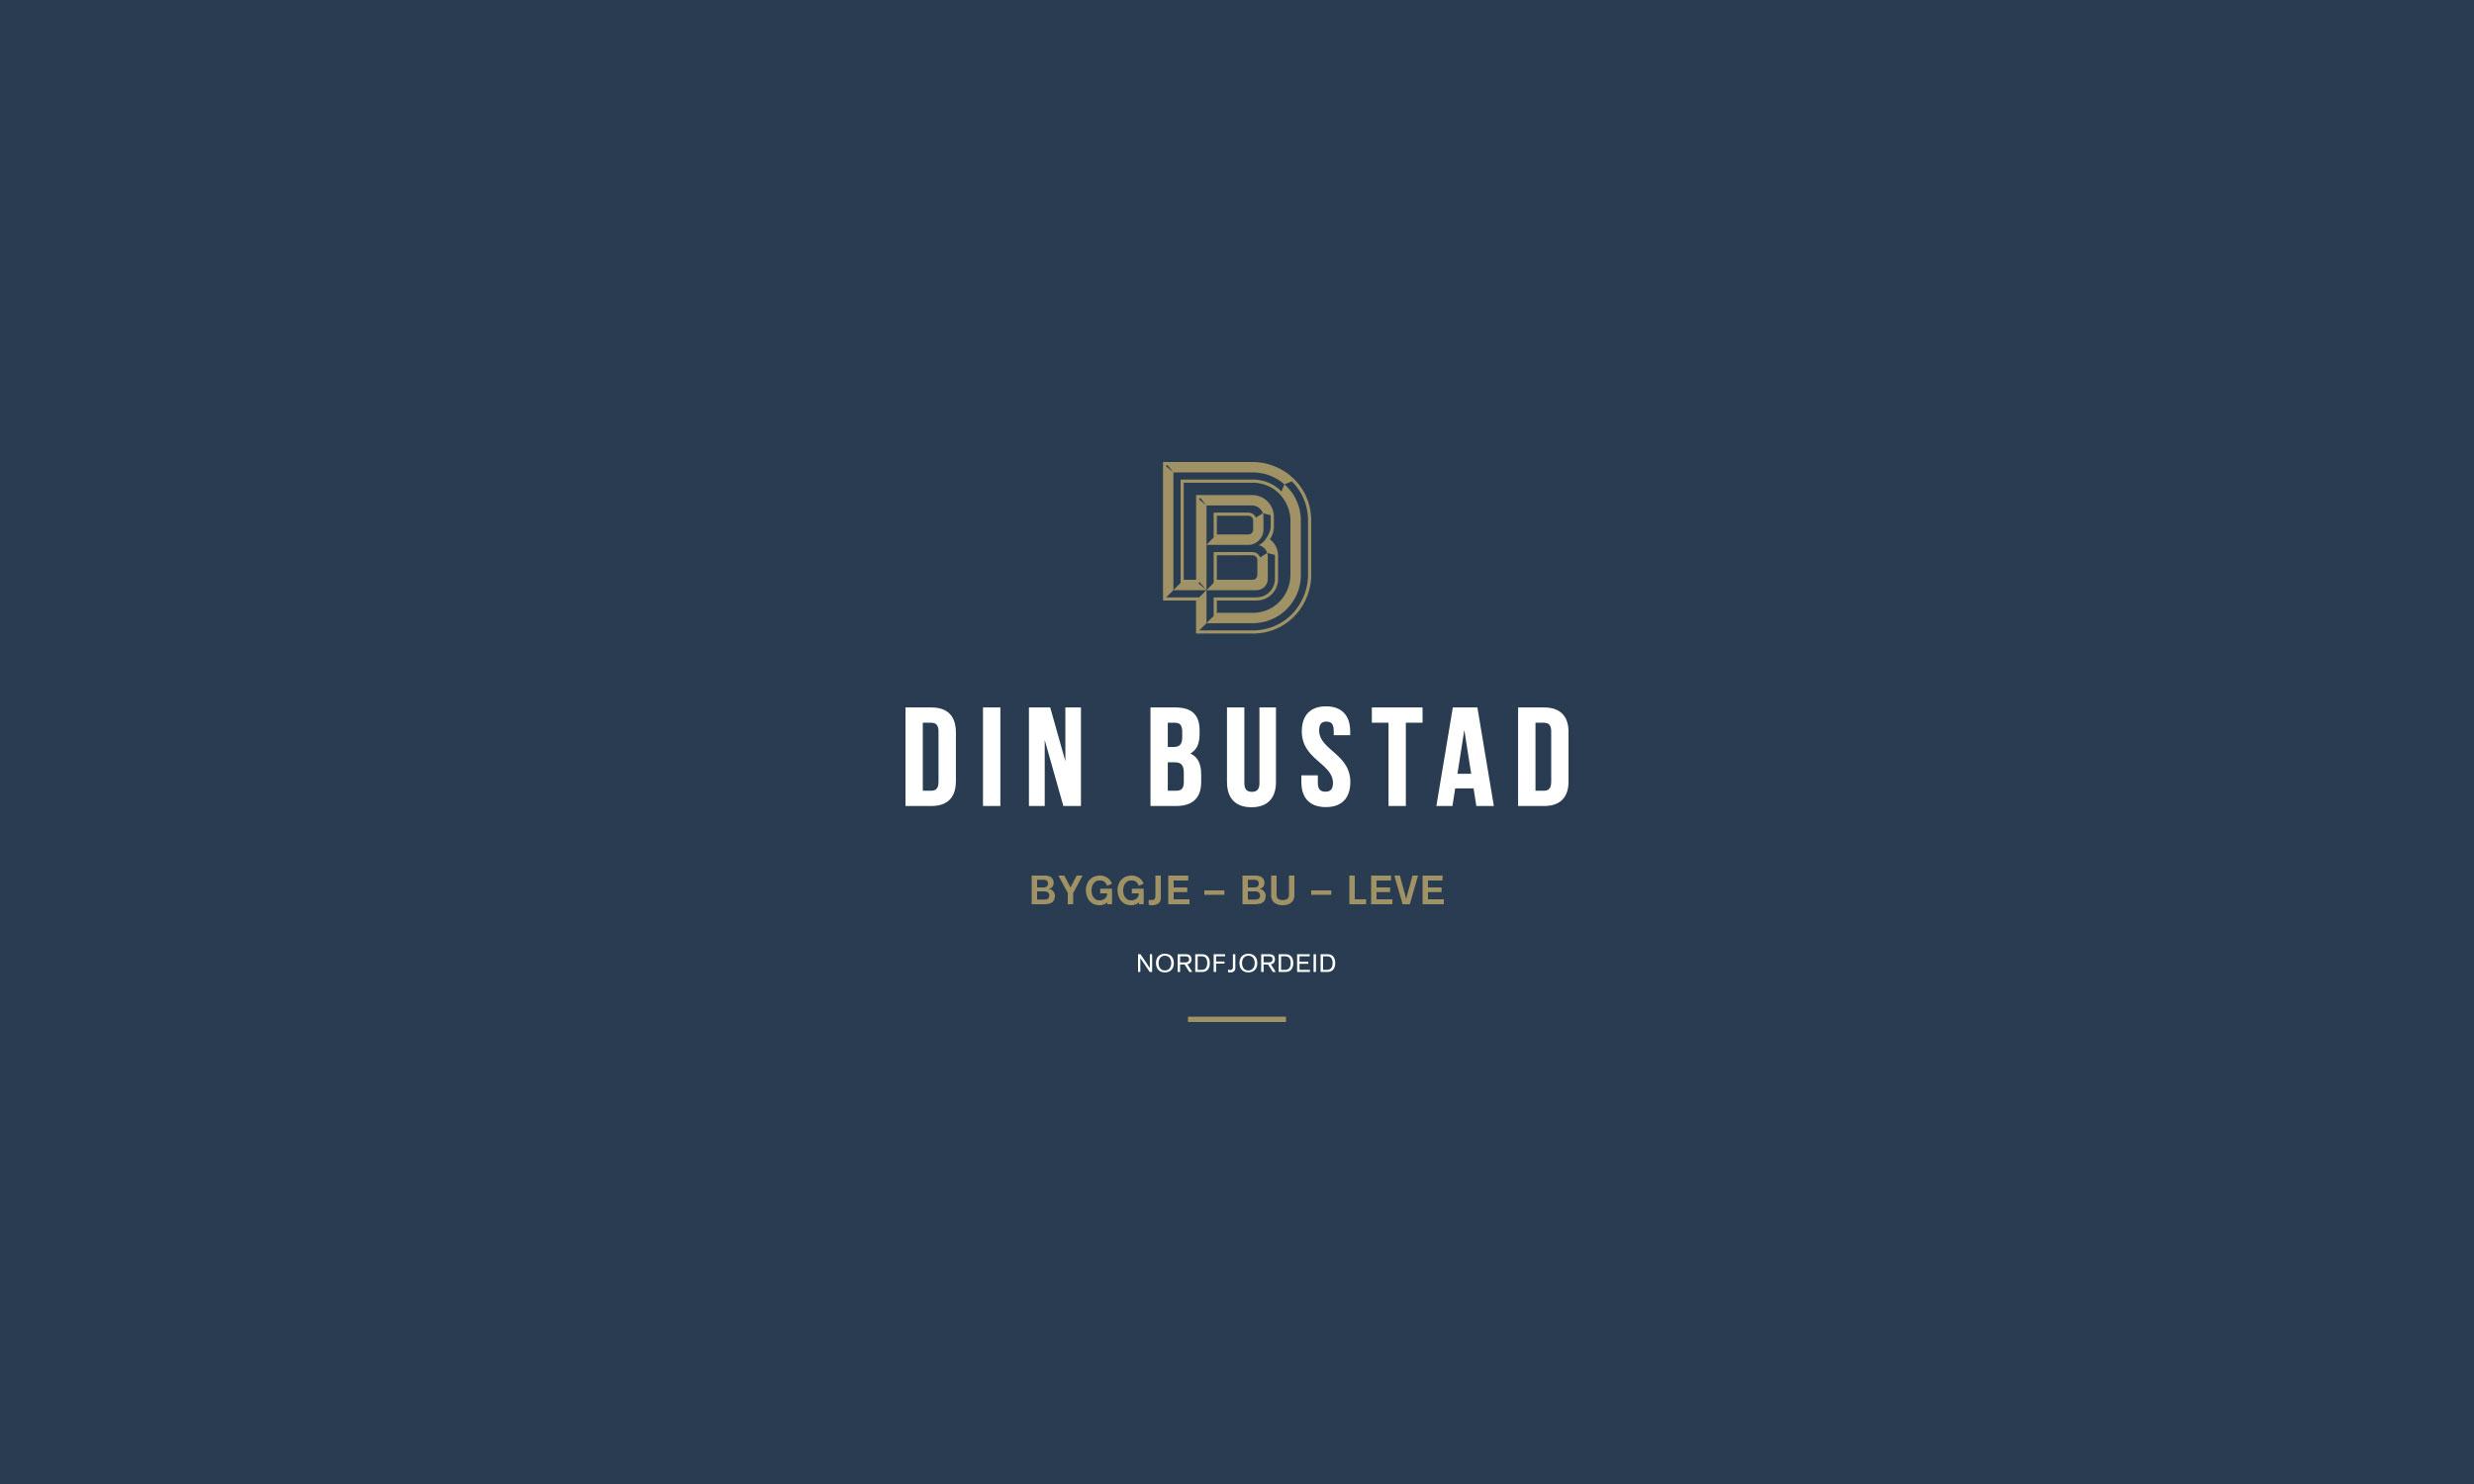 Din Bustad vertical light logo